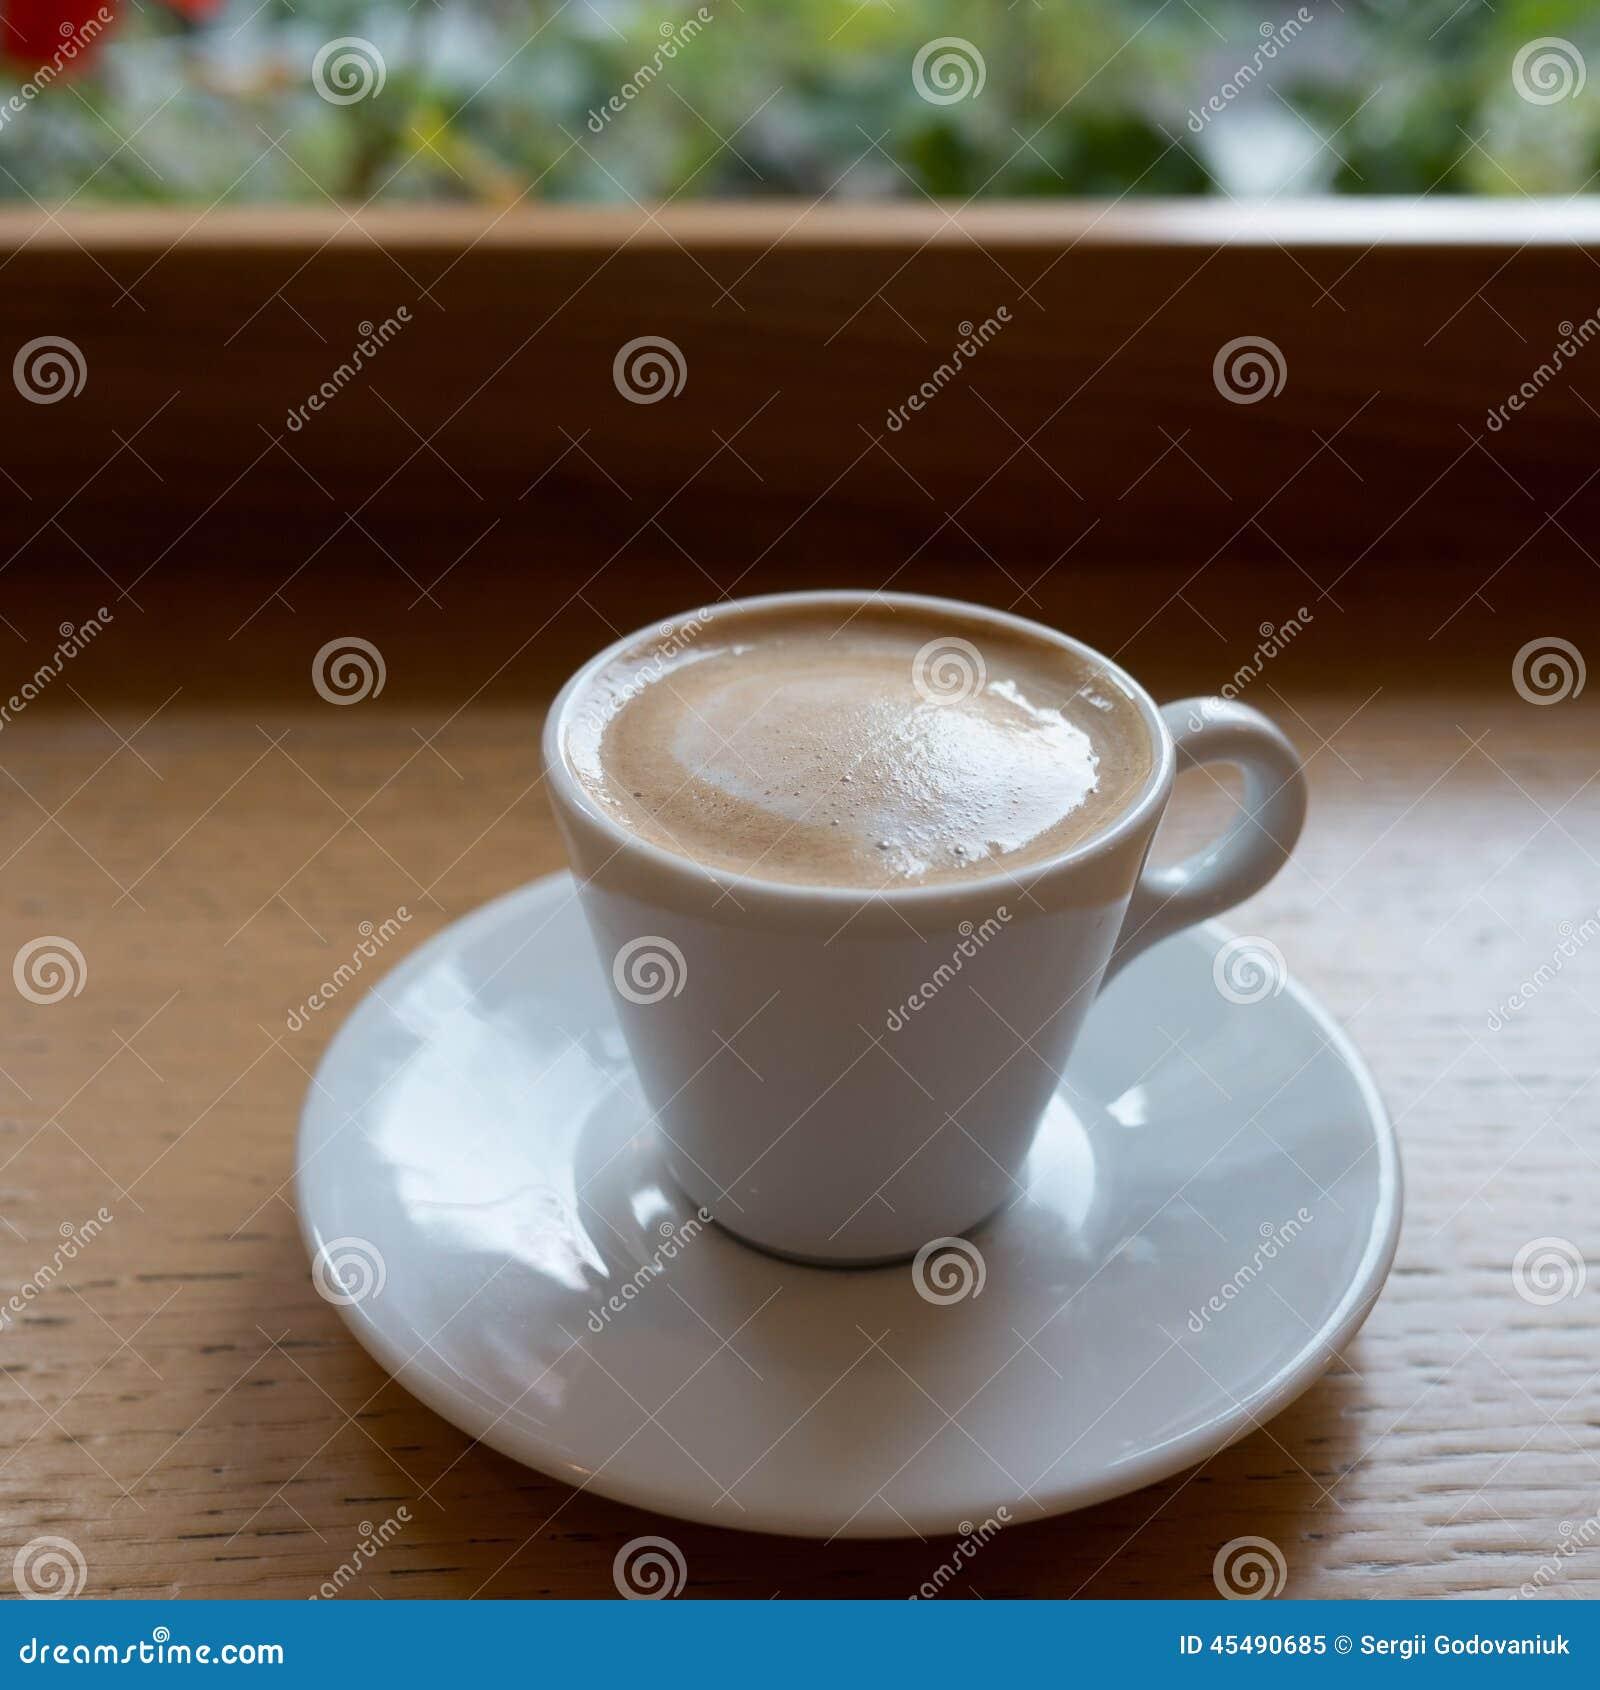 morning meditation tea table - photo #45